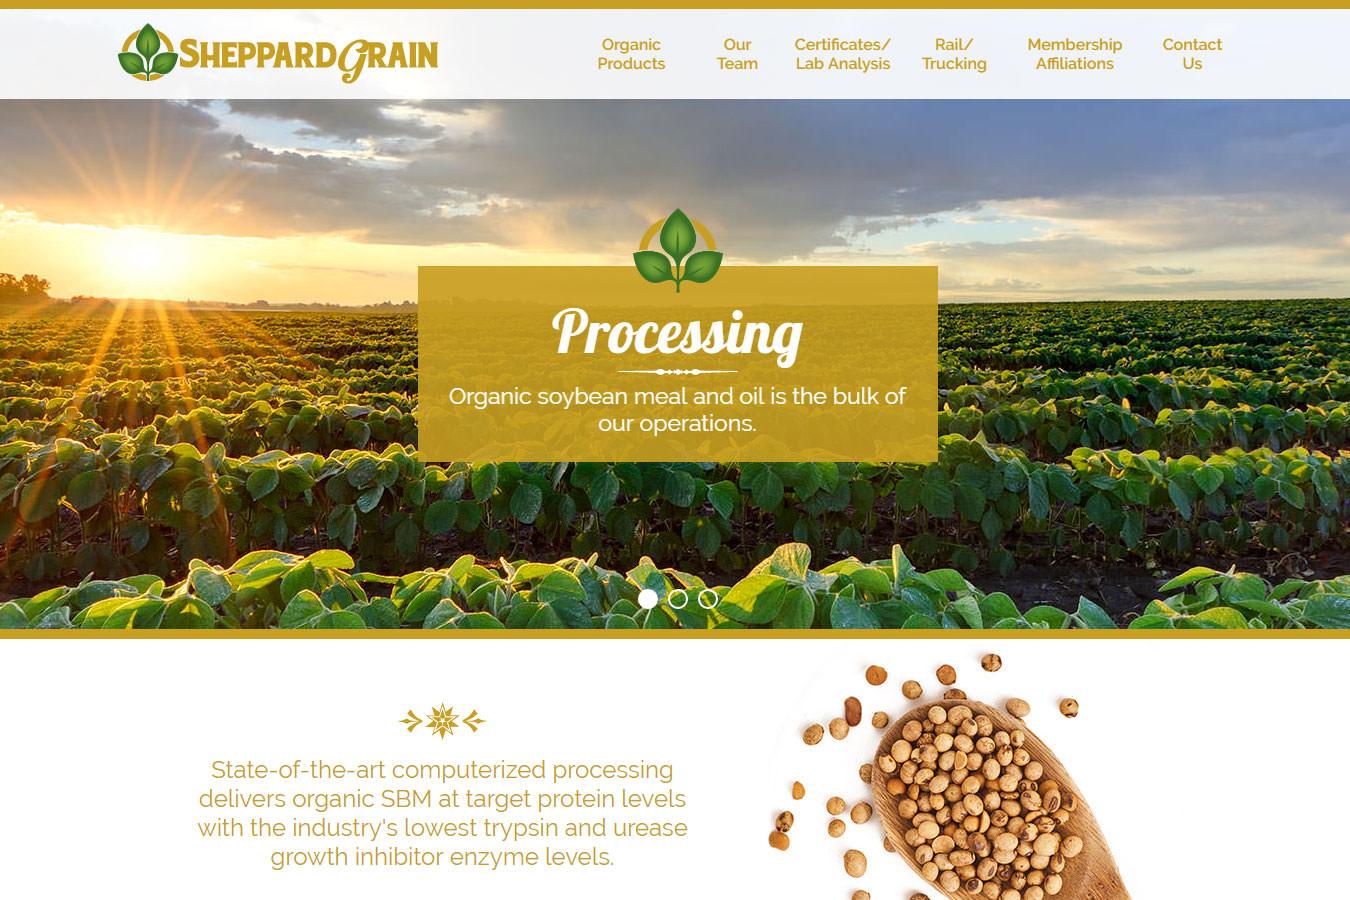 Sheppard Grain website homepage